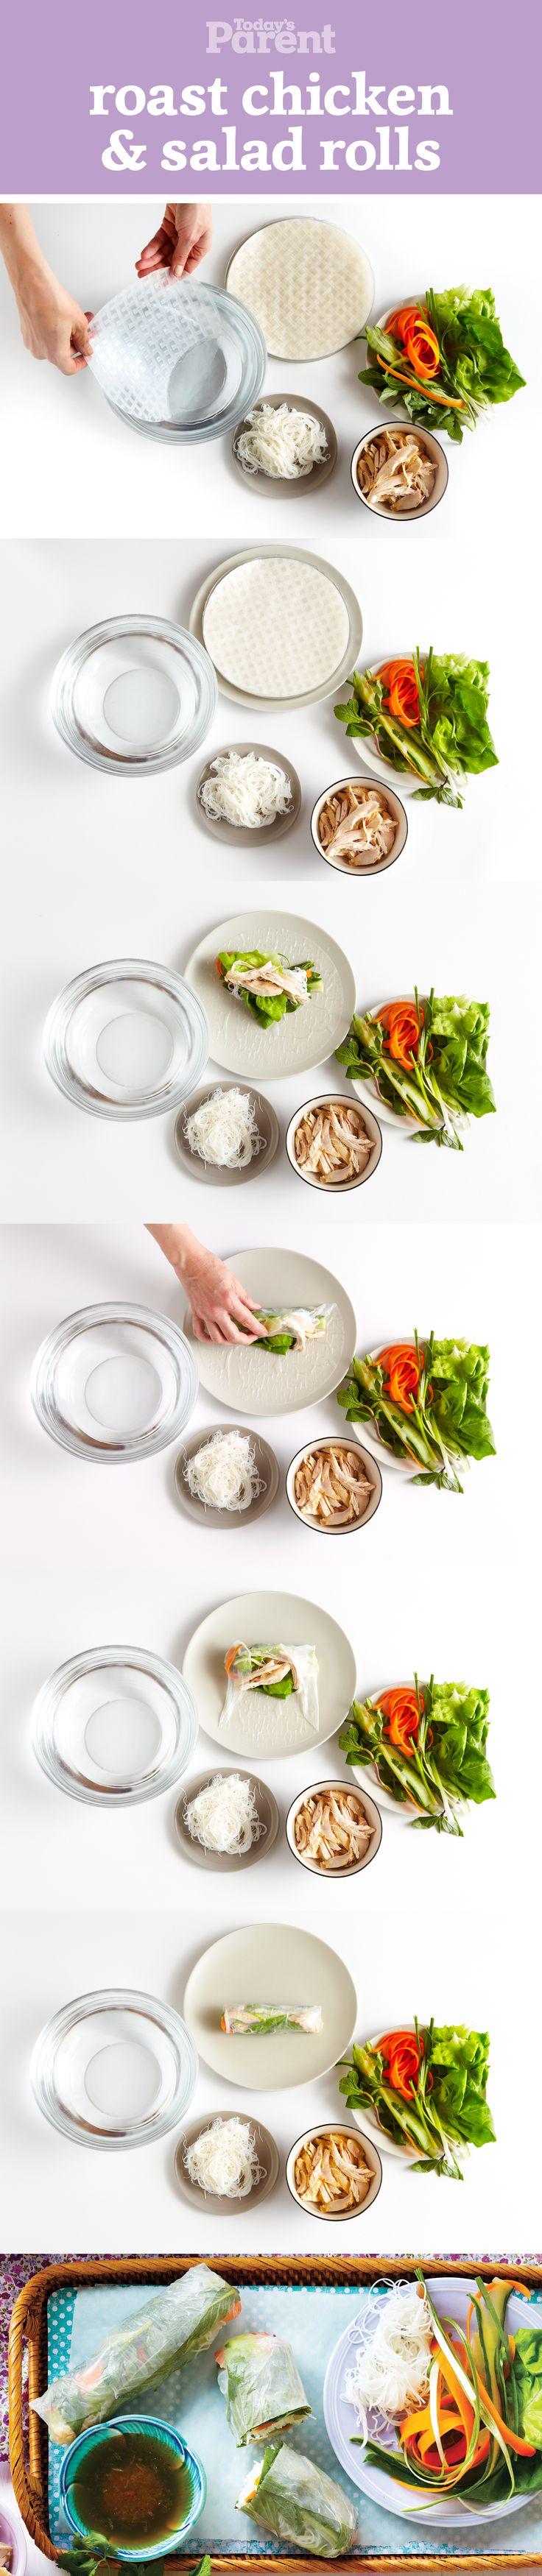 No-Cook Vietnamese Roast Chicken & Salad Rolls